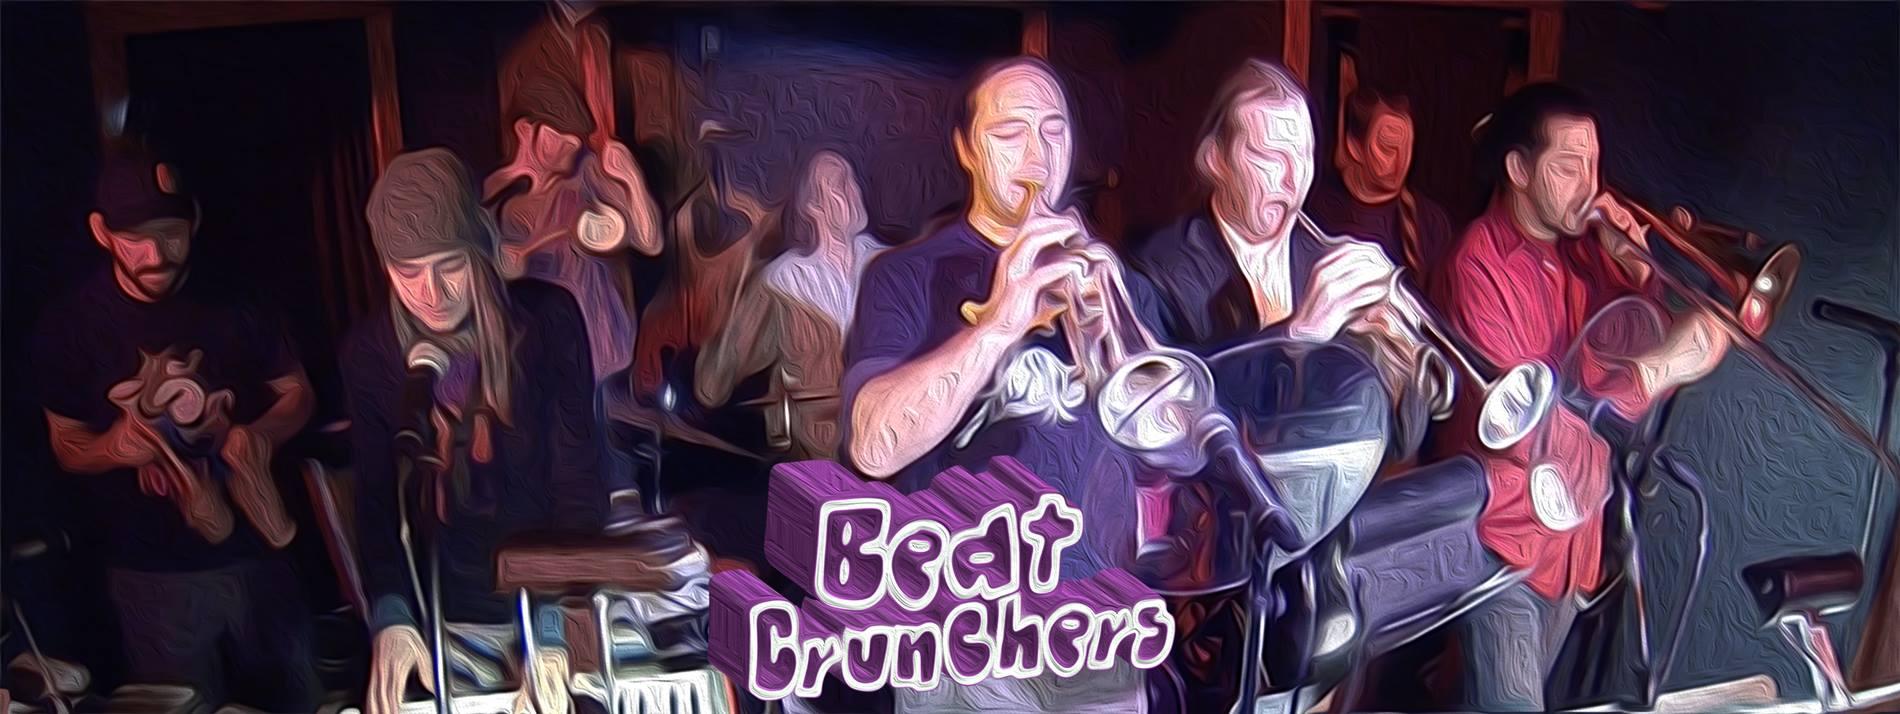 Beat-Crunchers